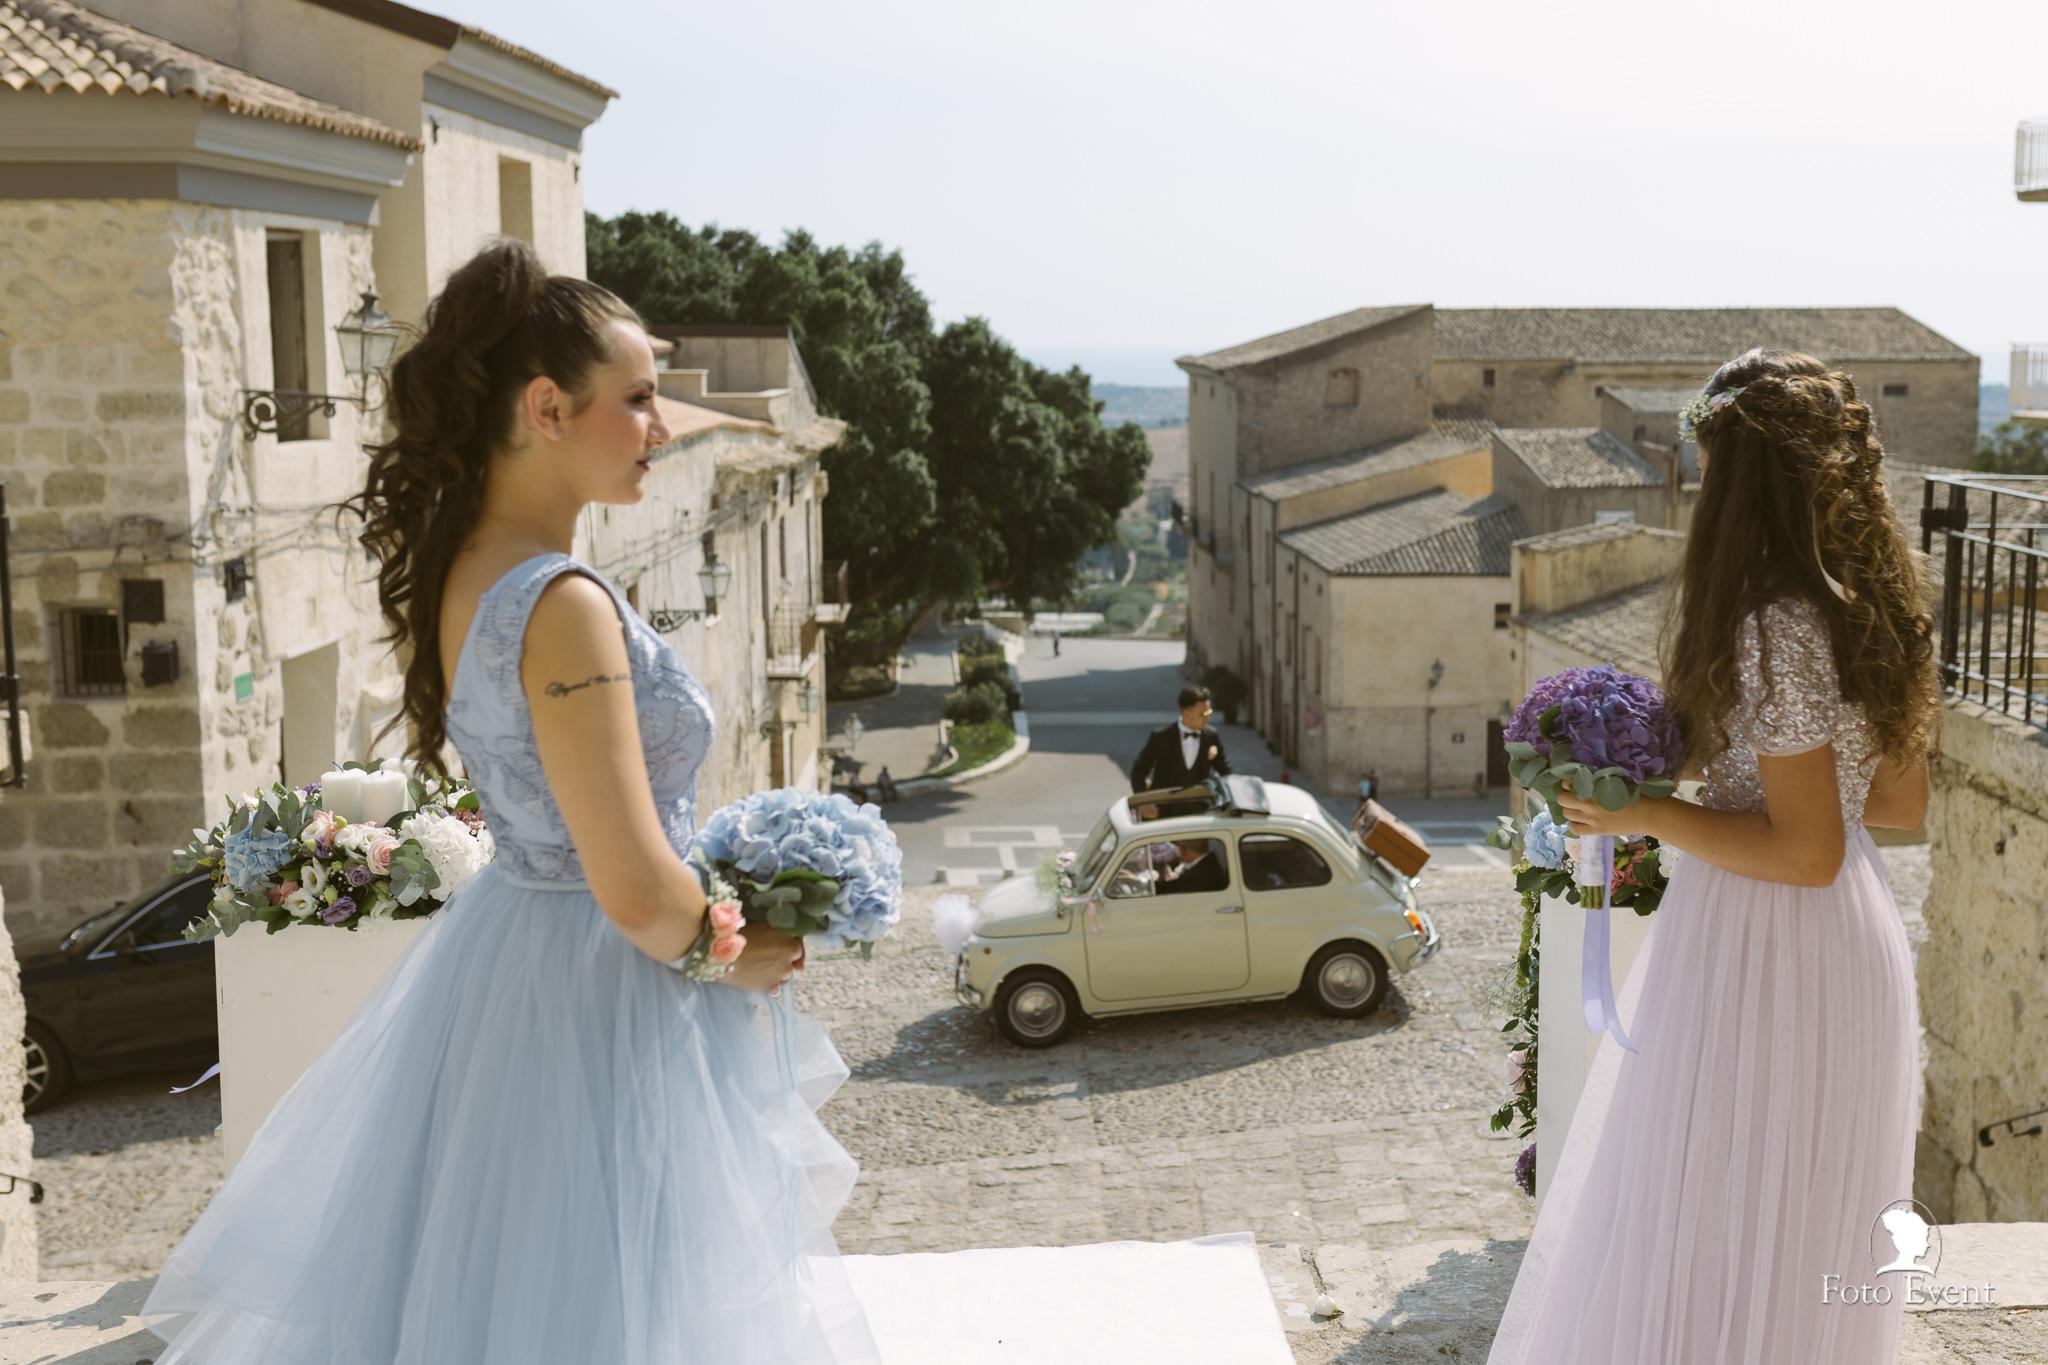 034-2019-08-22-Matrimonio-Angela-e-Nicola-Iaconis-Ric2-358